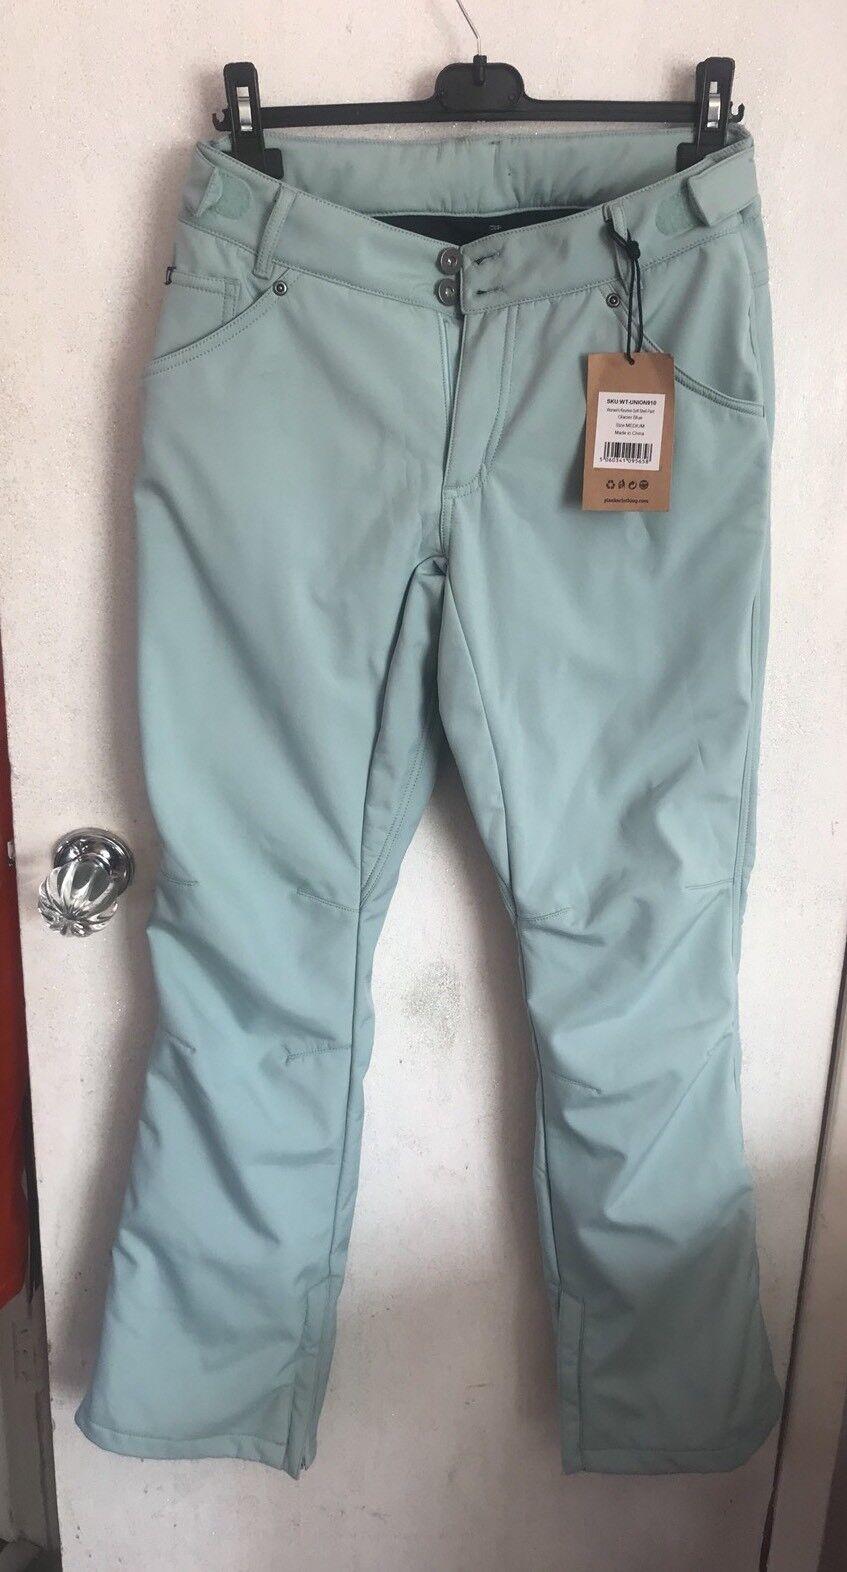 Planks Damenschuhe Ski Pants - Reunion Soft Shell - Glacier Blau MEDIUM BEST PRICE